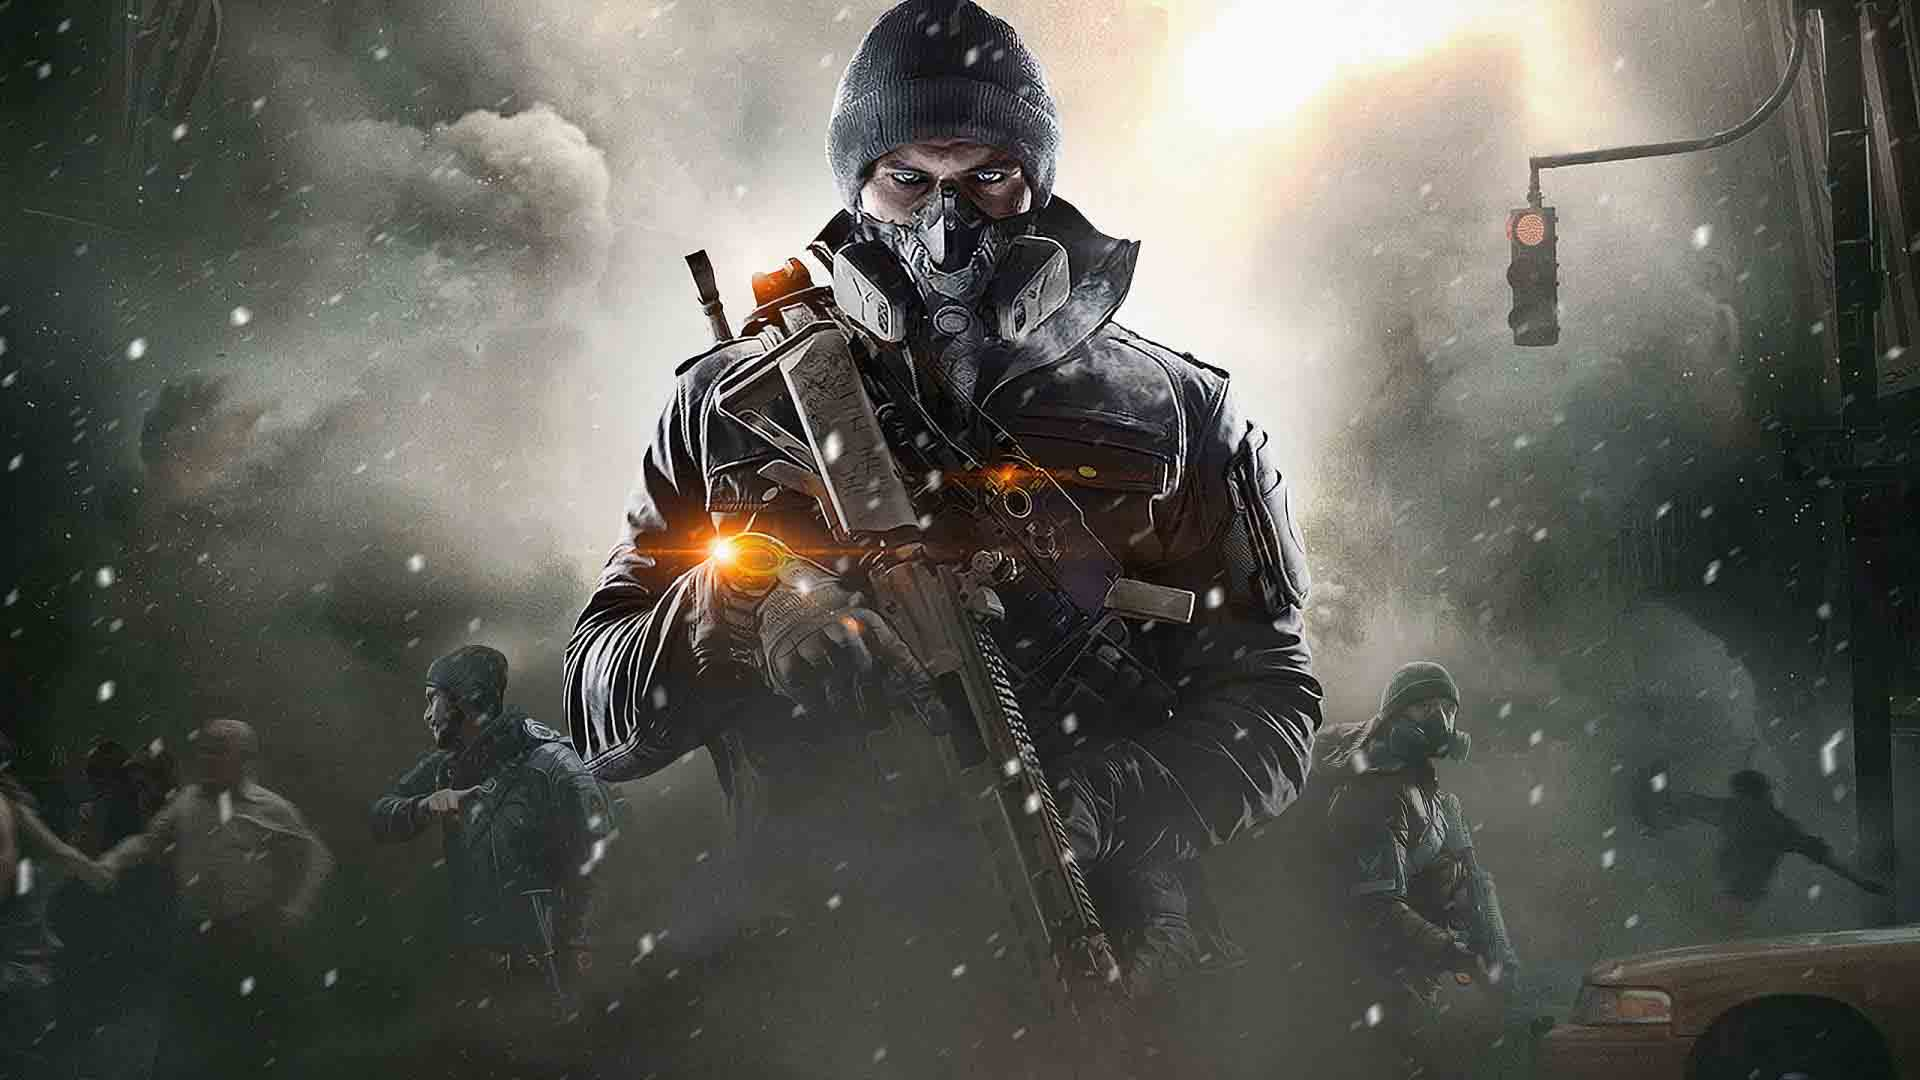 Call Of Duty WW2's New War Mode Makes Multiplayer Fresh